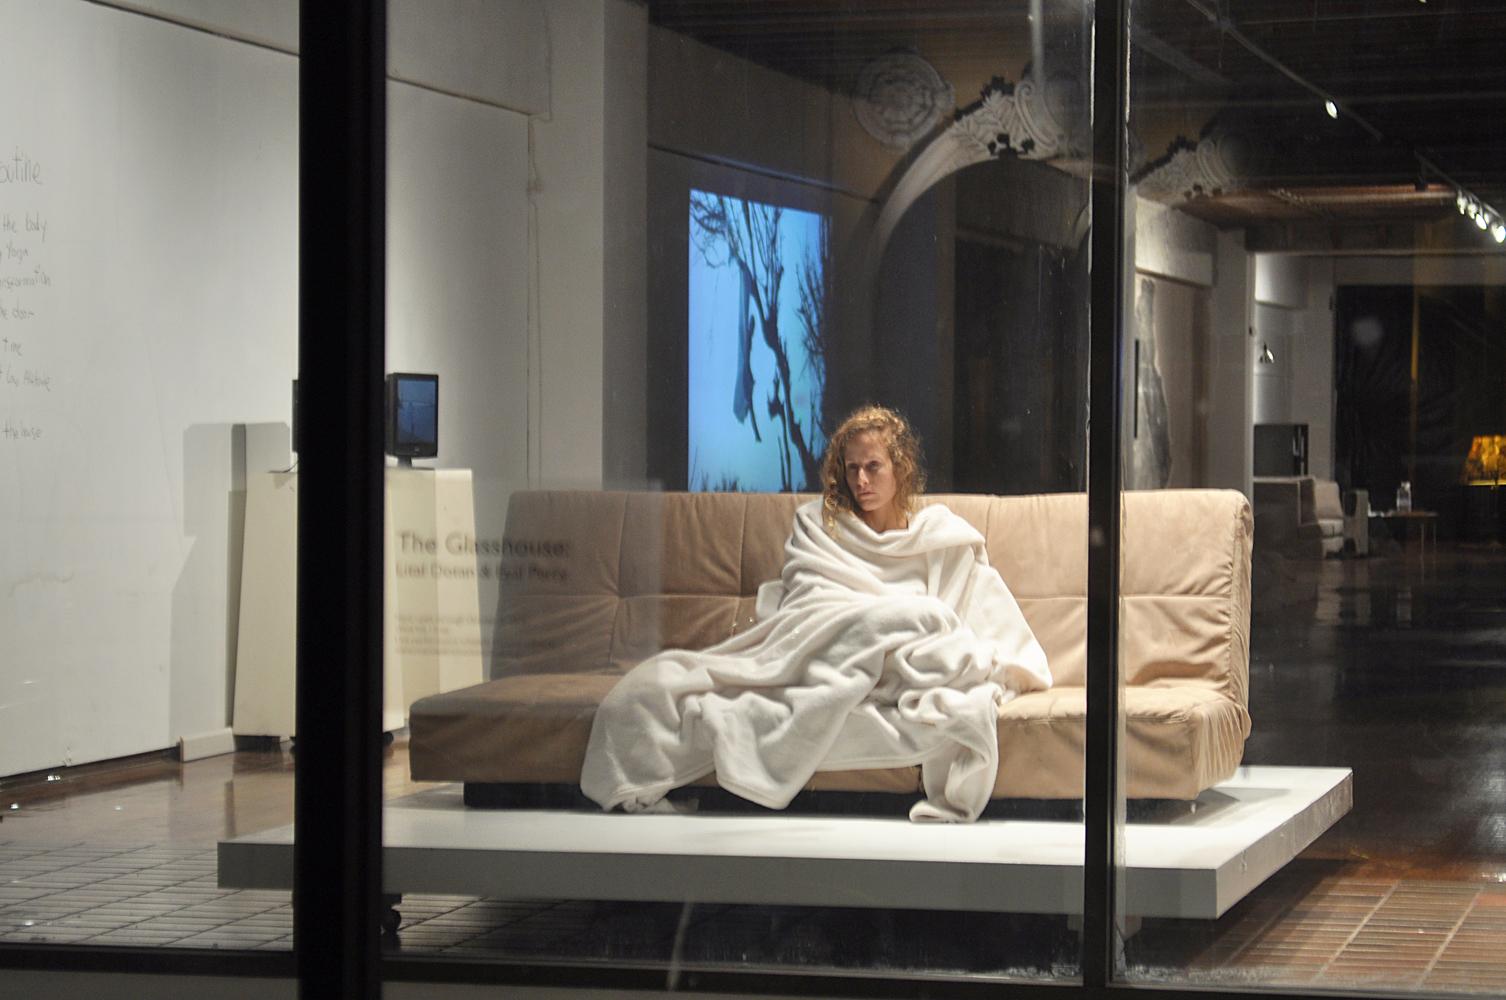 Couch Potato  (Glasshouse, 575 Sutter St, San-Francisco, 2010)